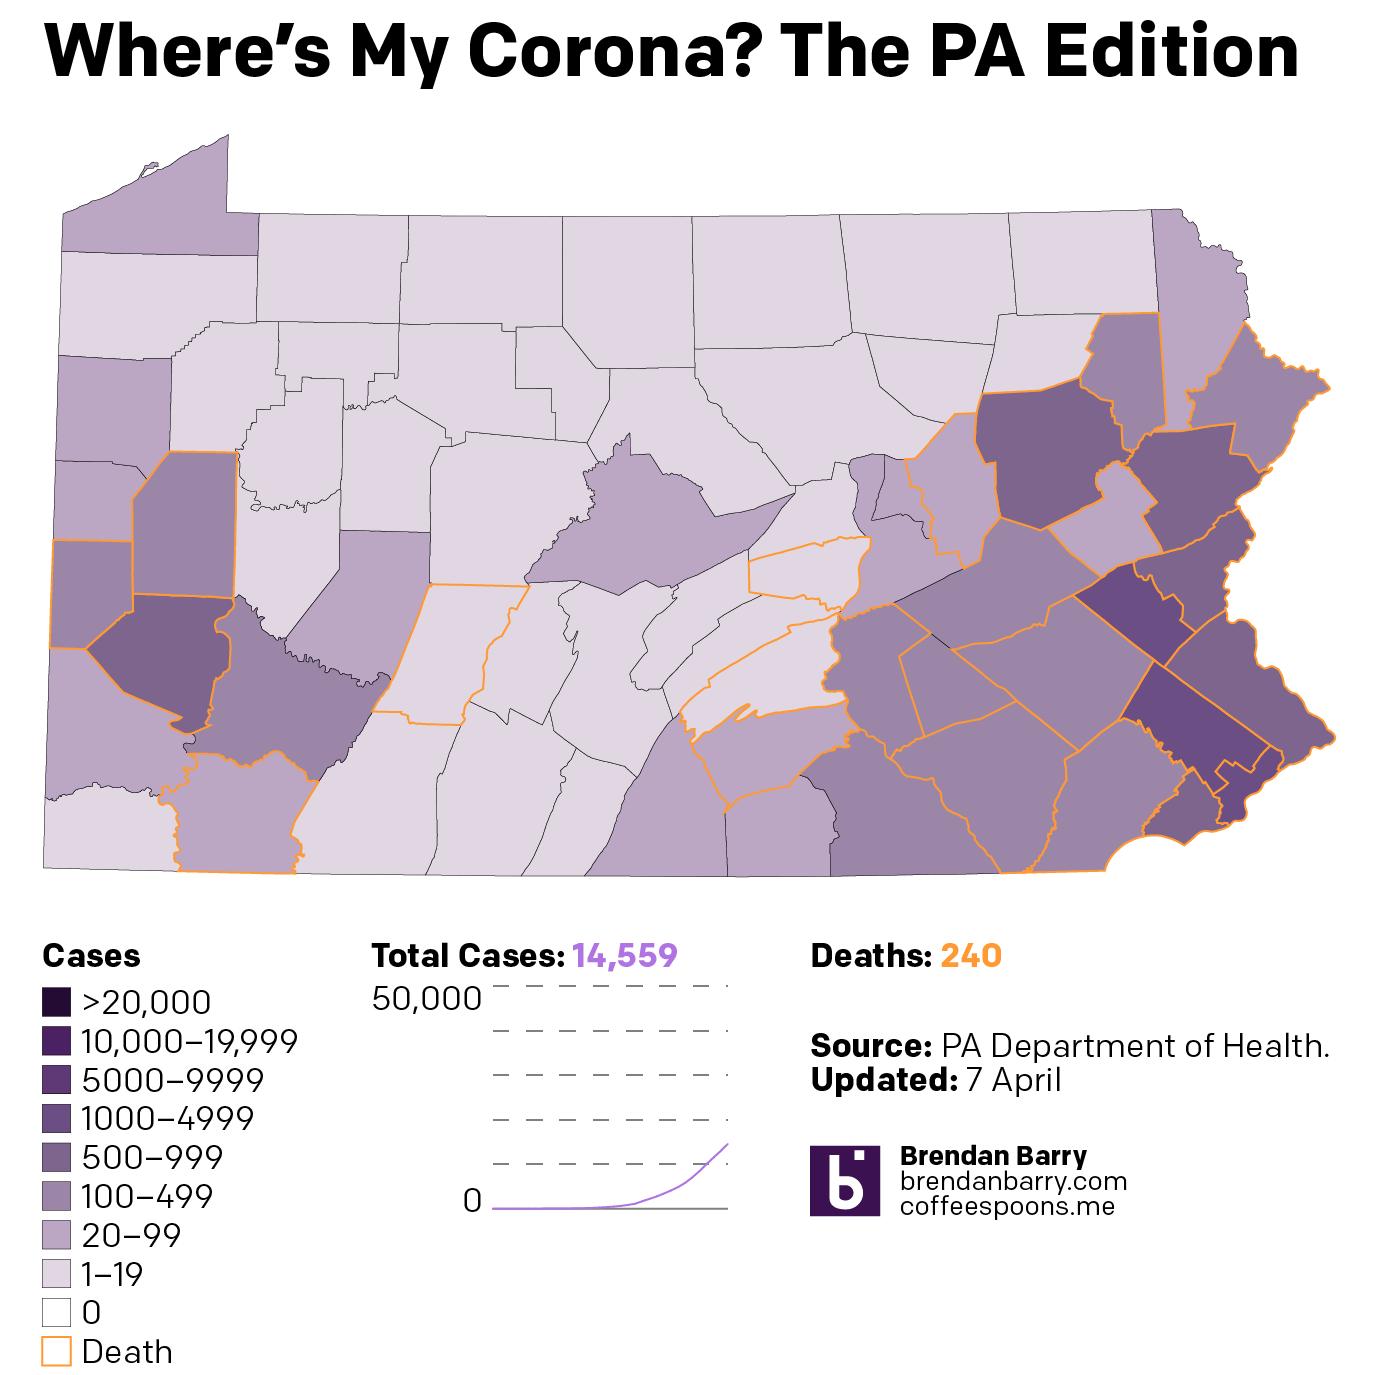 The condition in Pennsylvania